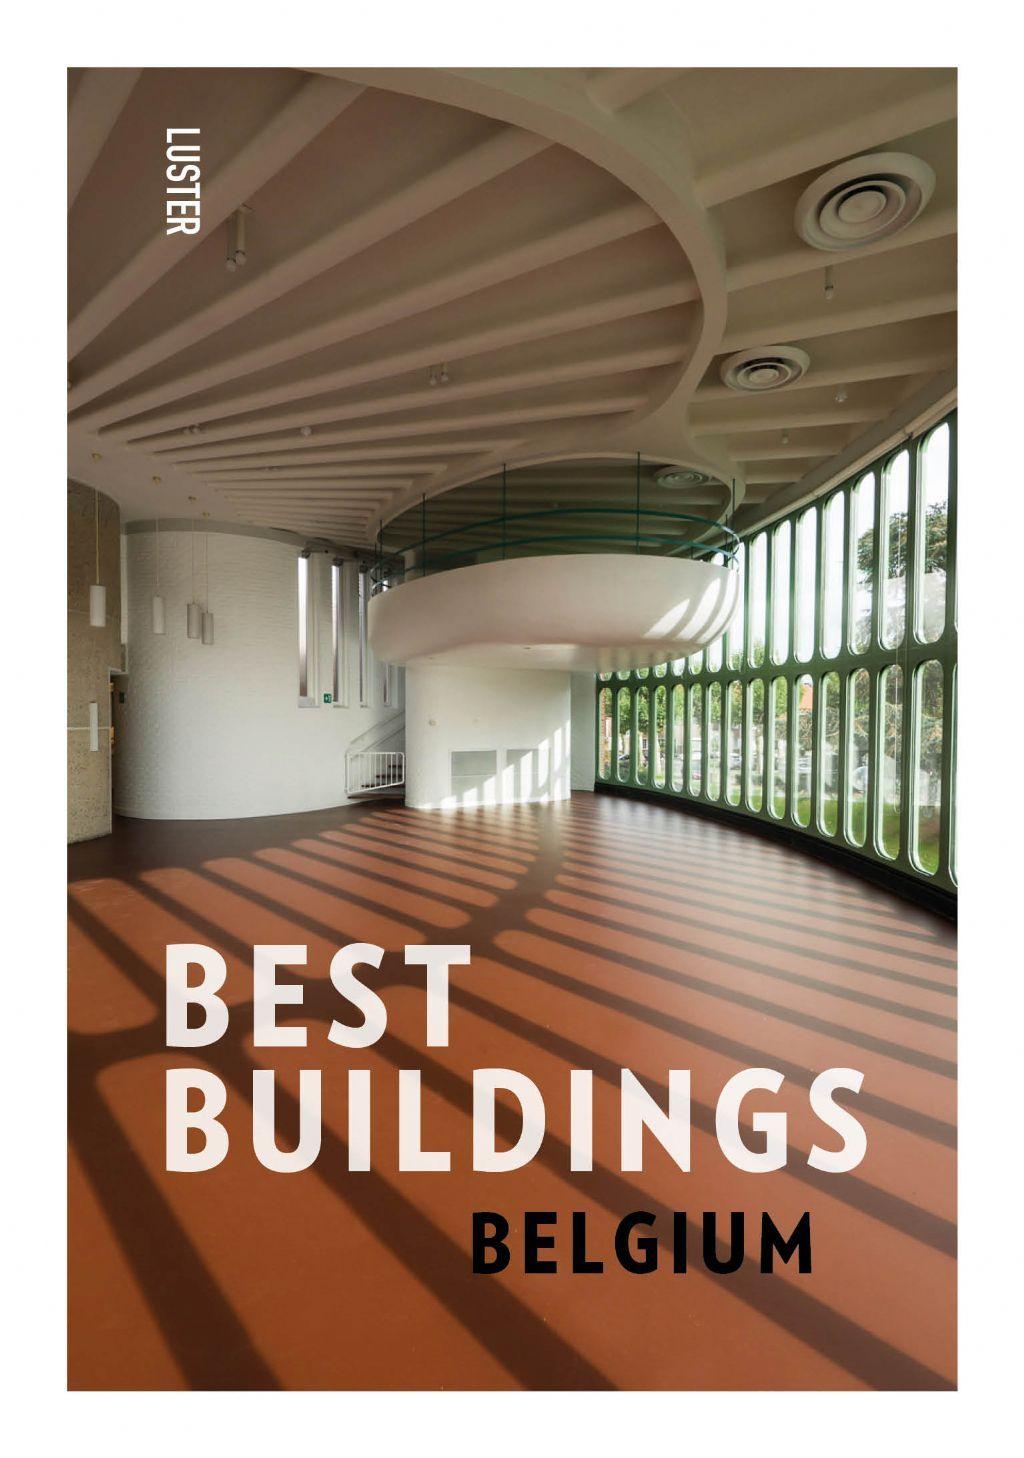 Recensie (Filip Canfyn): Best Buildings - Belgium